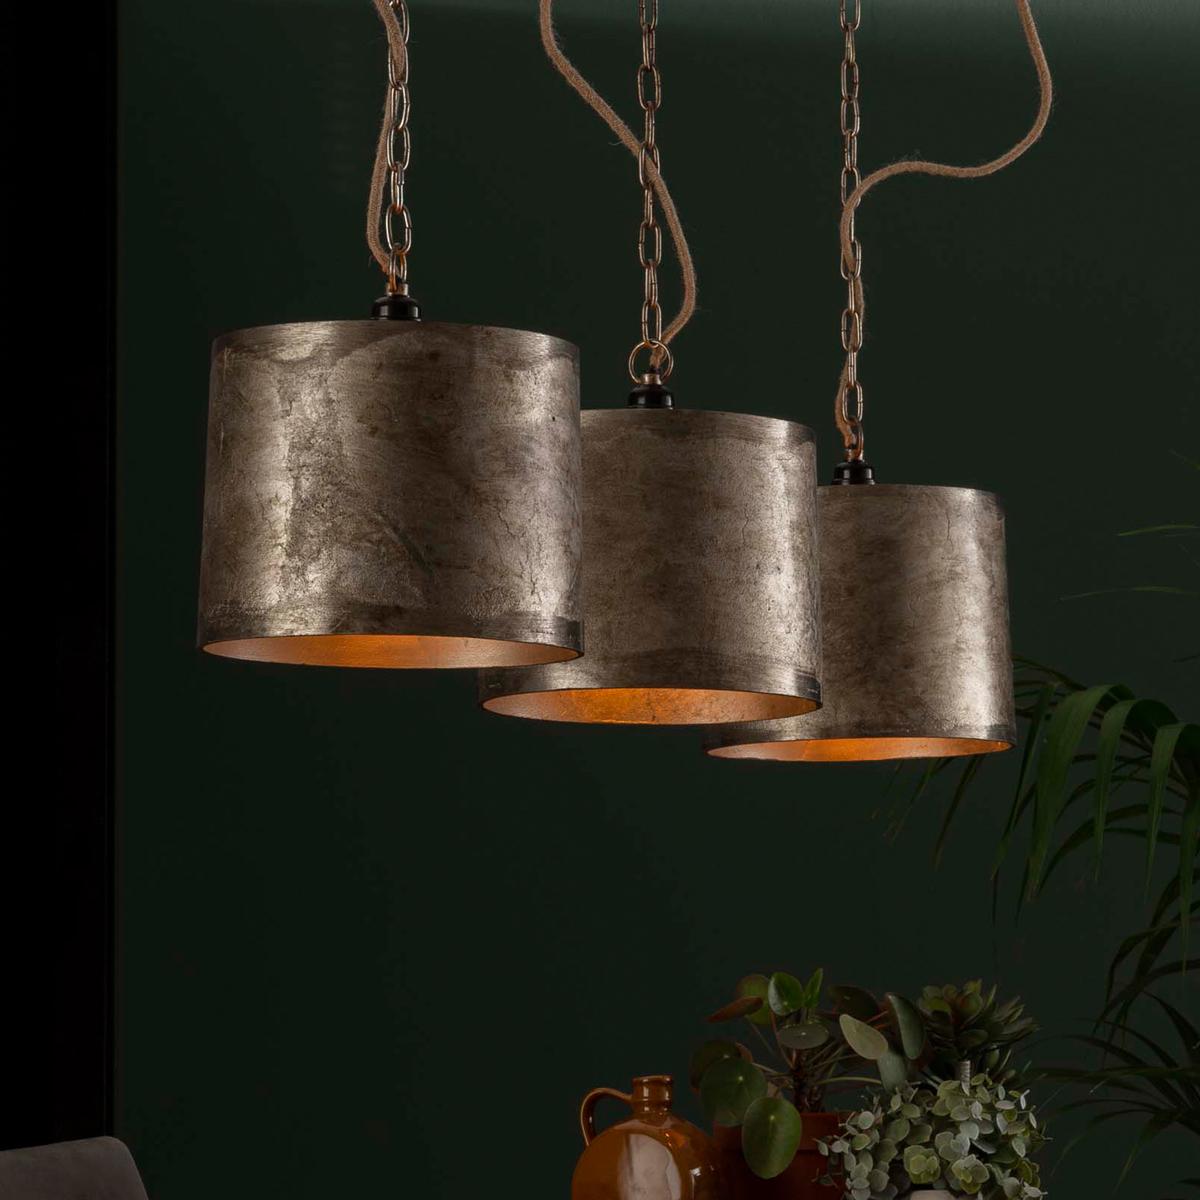 3-delige hanglamp antiek nikkel